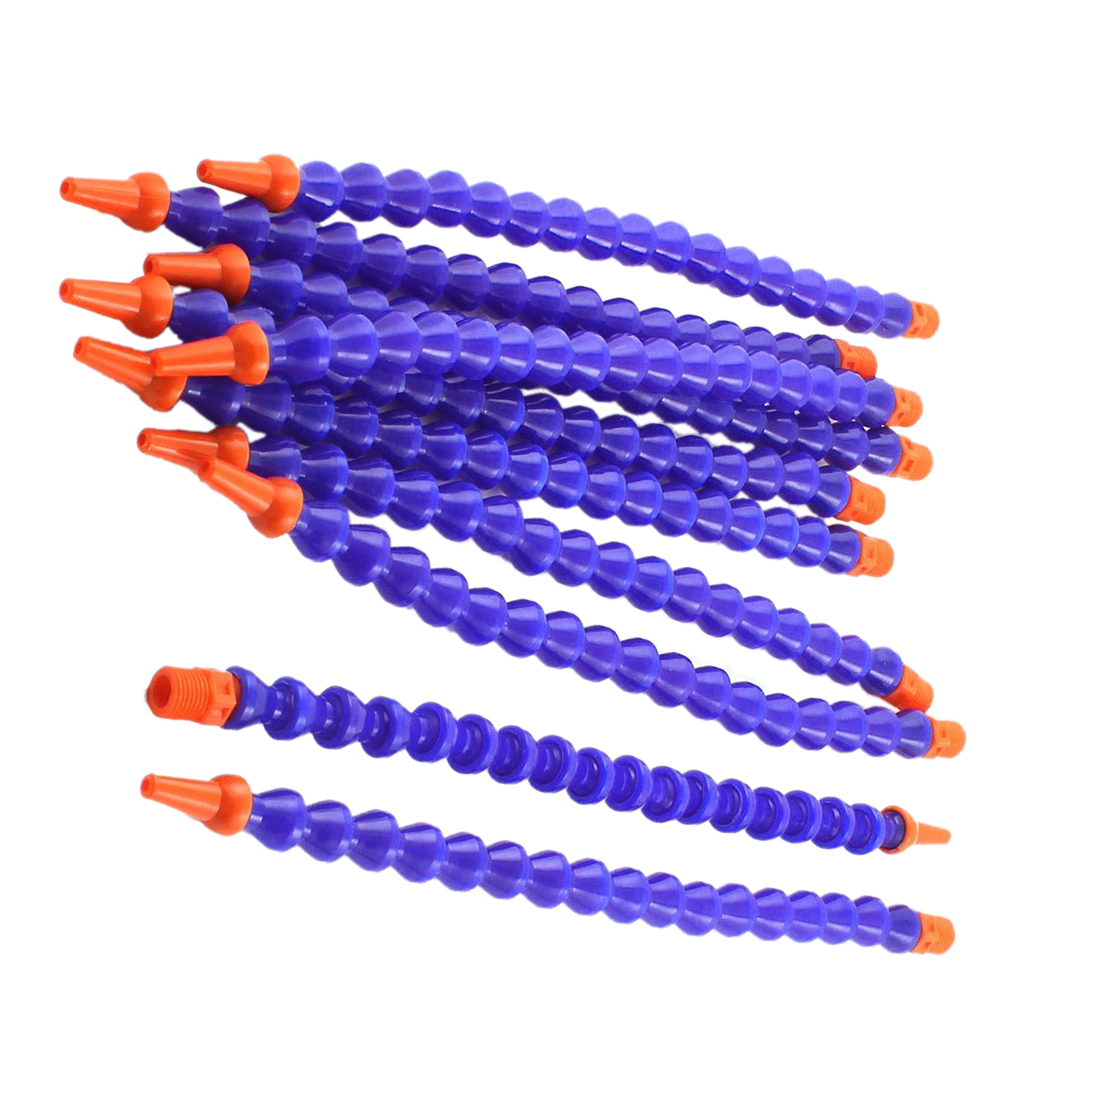 WSFS Hot 10 PCs boquilla unids redonda 1/4PT manguera de tubo de refrigerante de aceite Flexible azul naranja para CNC máquina torno fresado tubo de enfriamiento al por menor